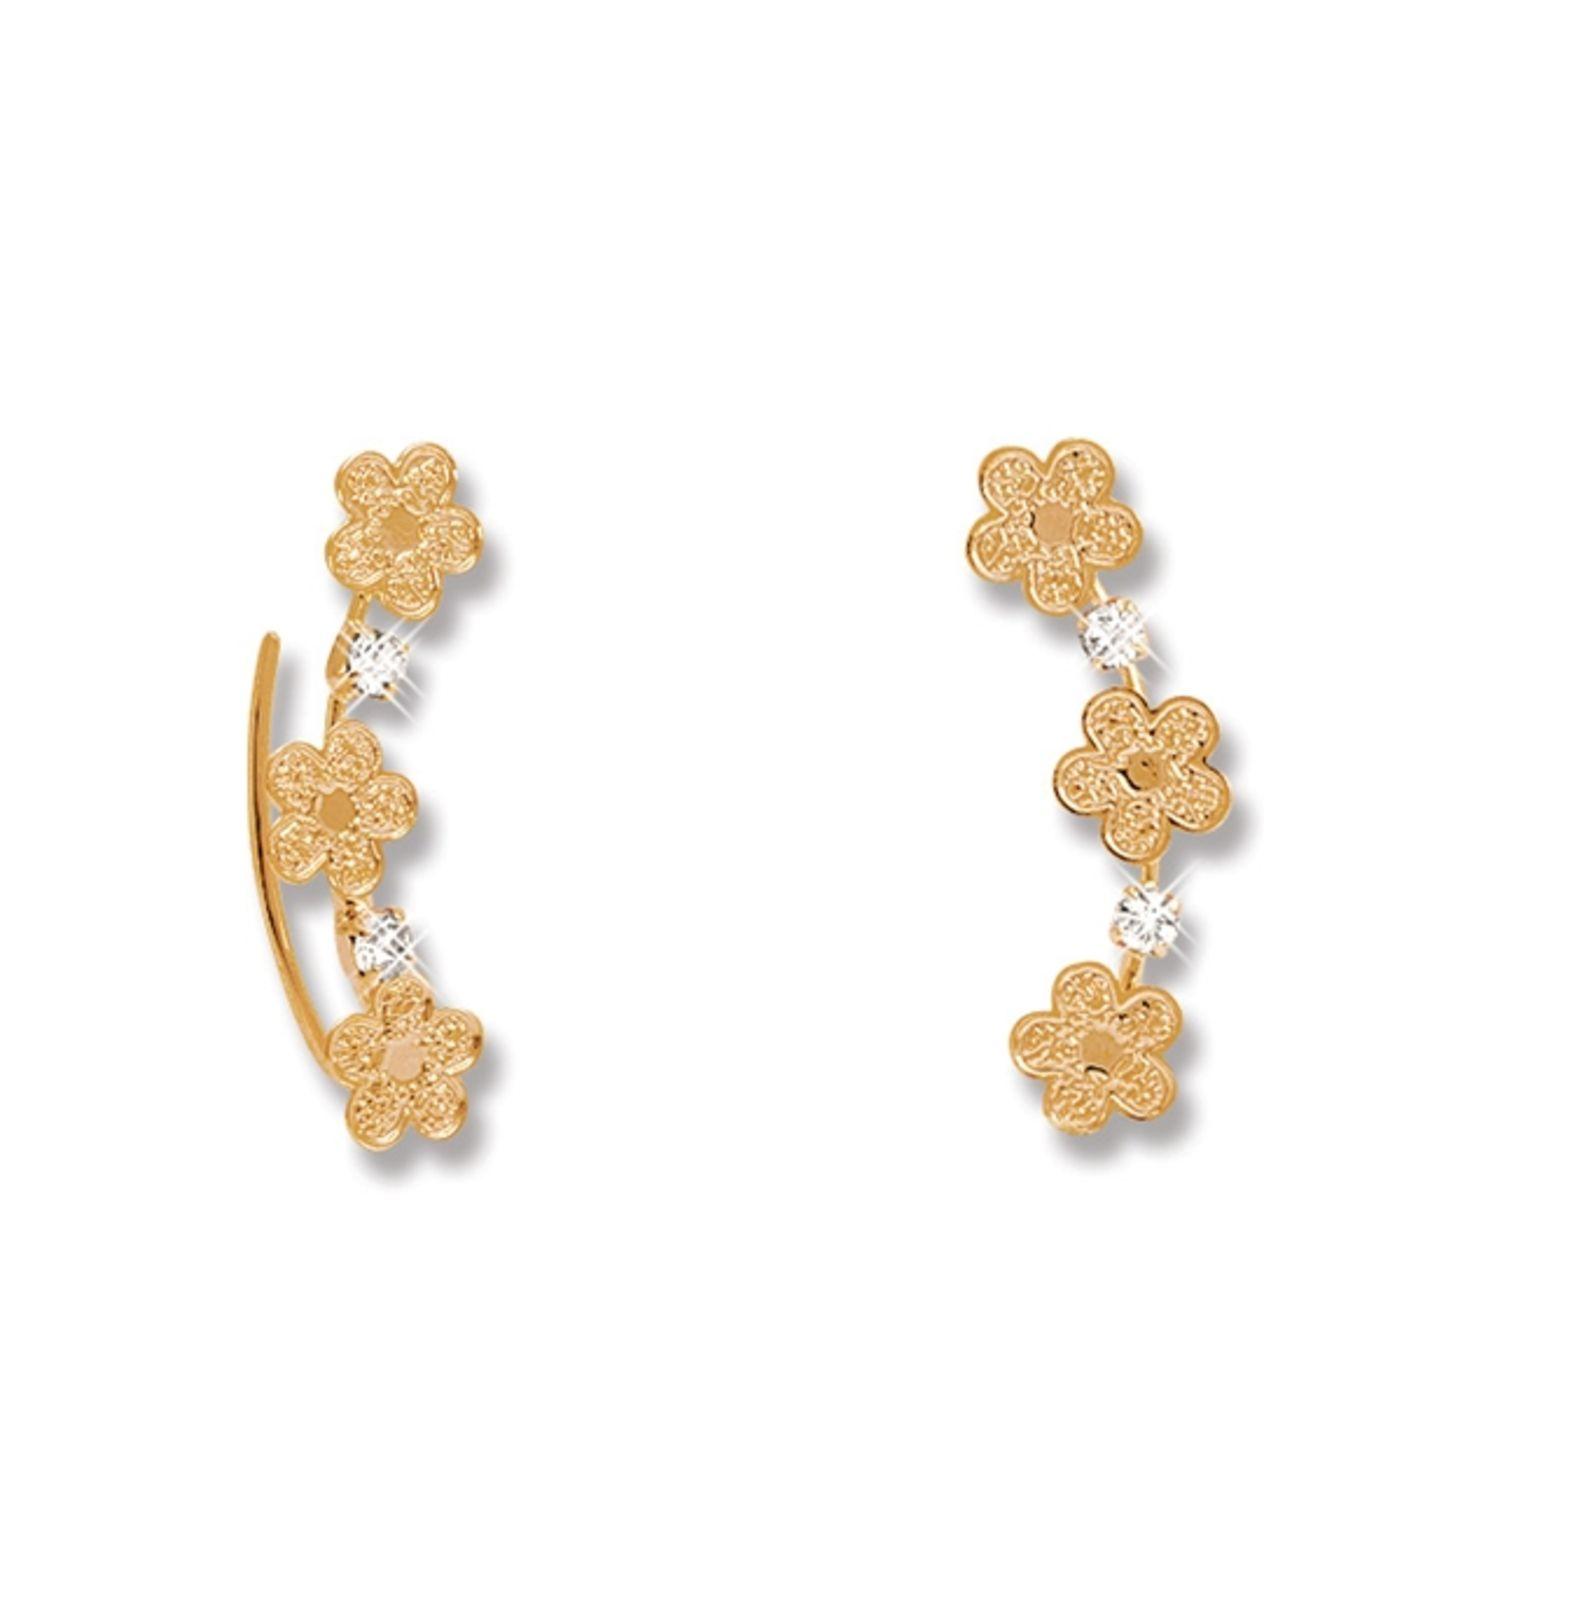 Brinco Le Diamond Ear Cuff com Flores Dourada